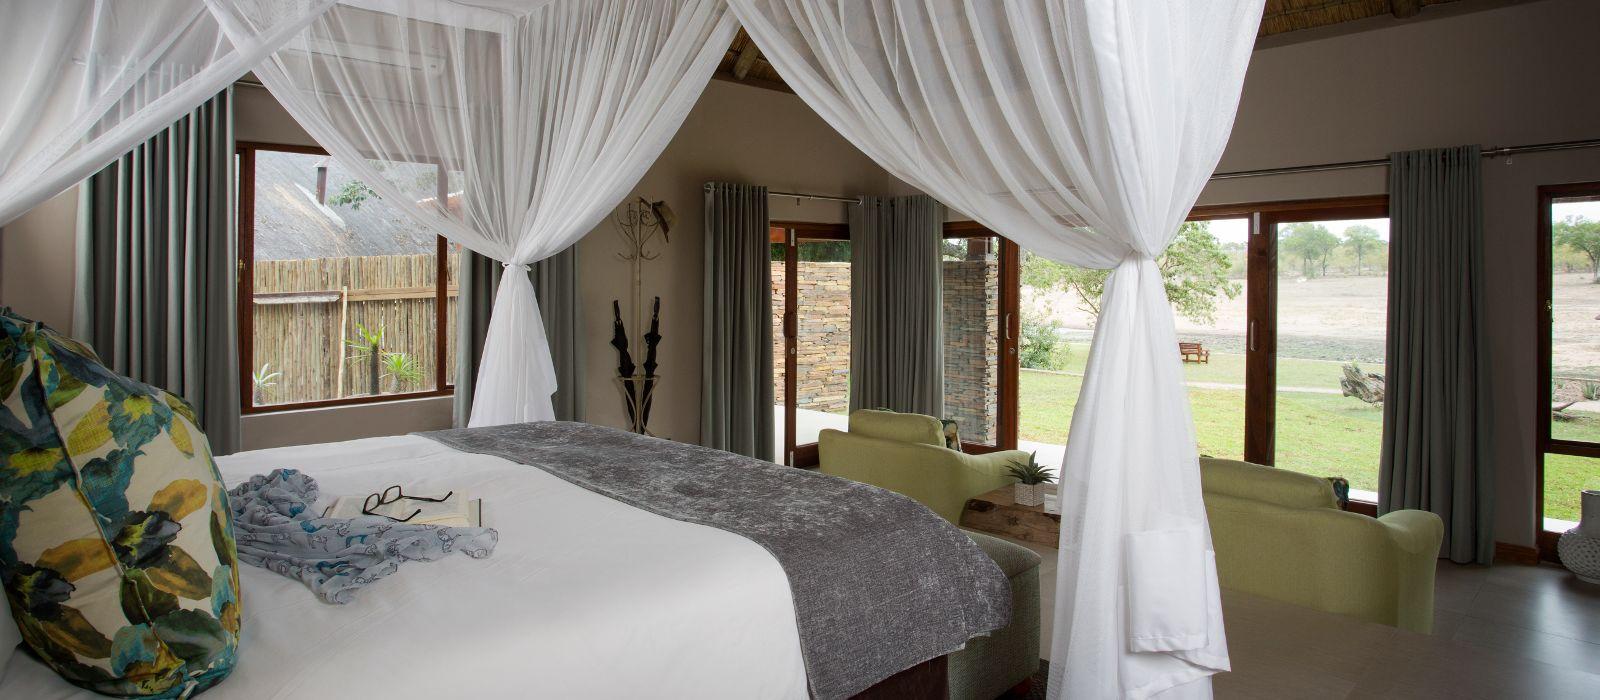 Hotel Arathusa Safari Lodge South Africa